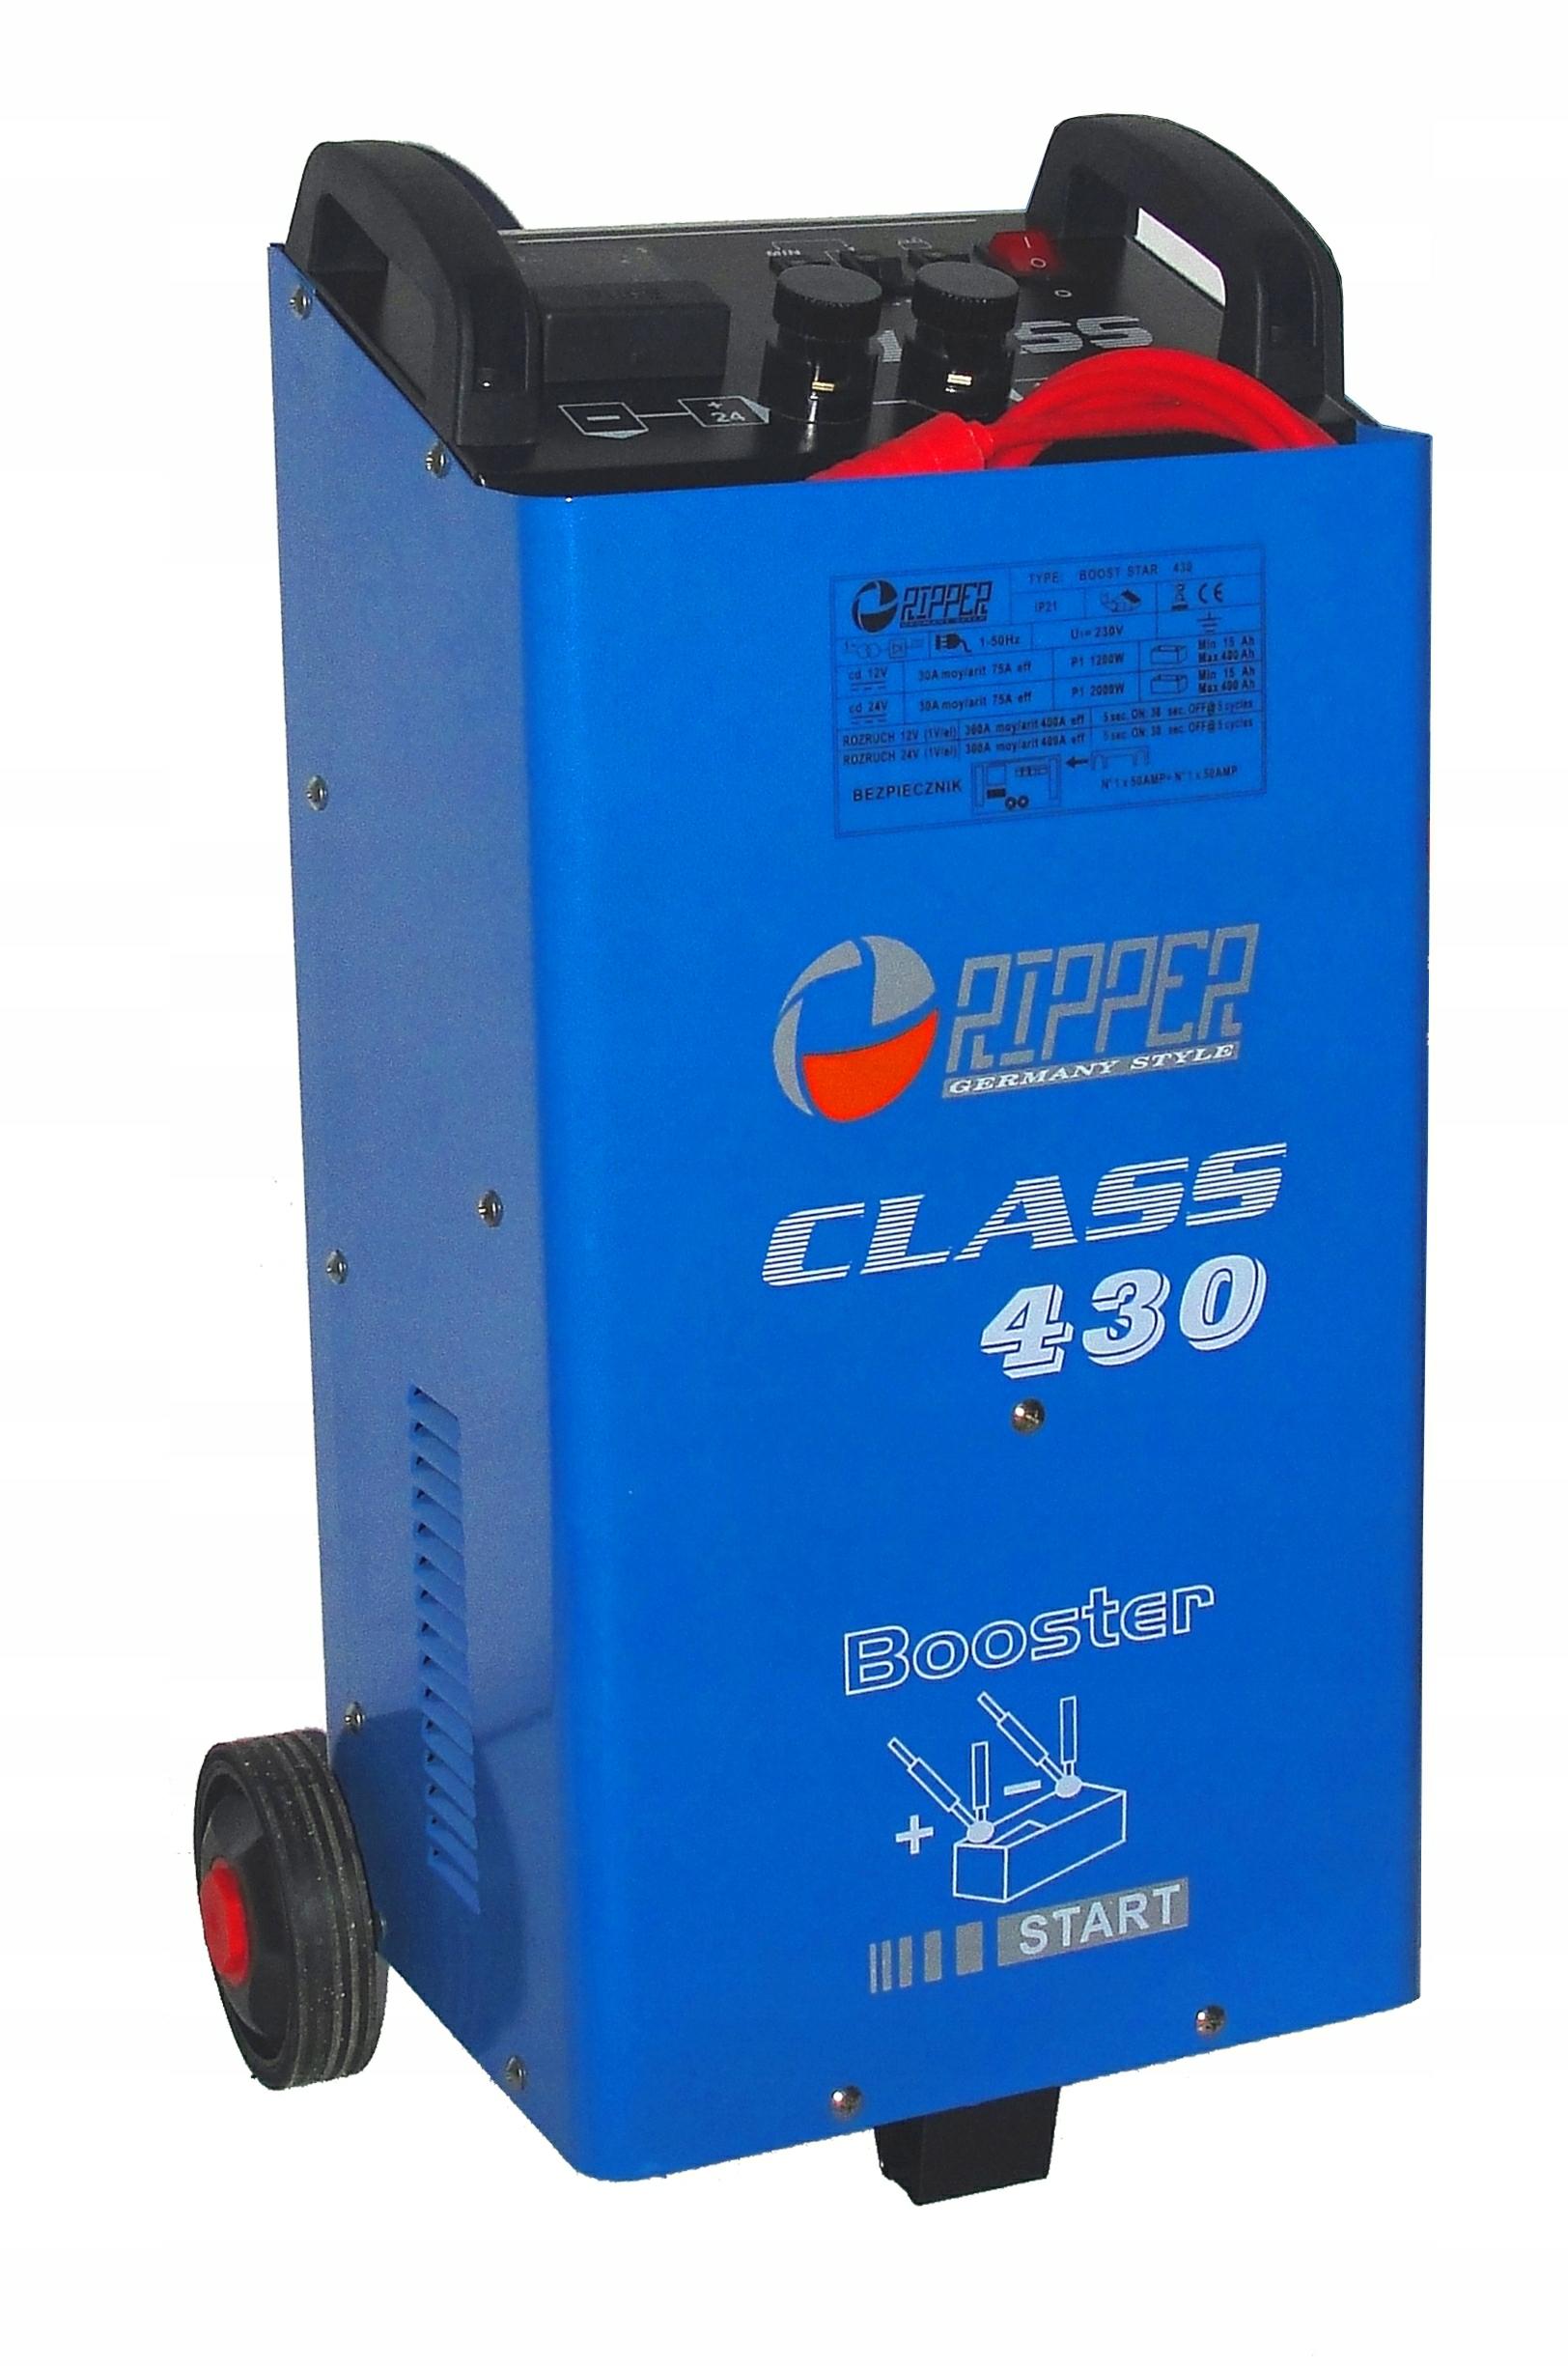 ROZRUCH - PROSTOWNIK CLASS 430 400A RIPPER 12/24V